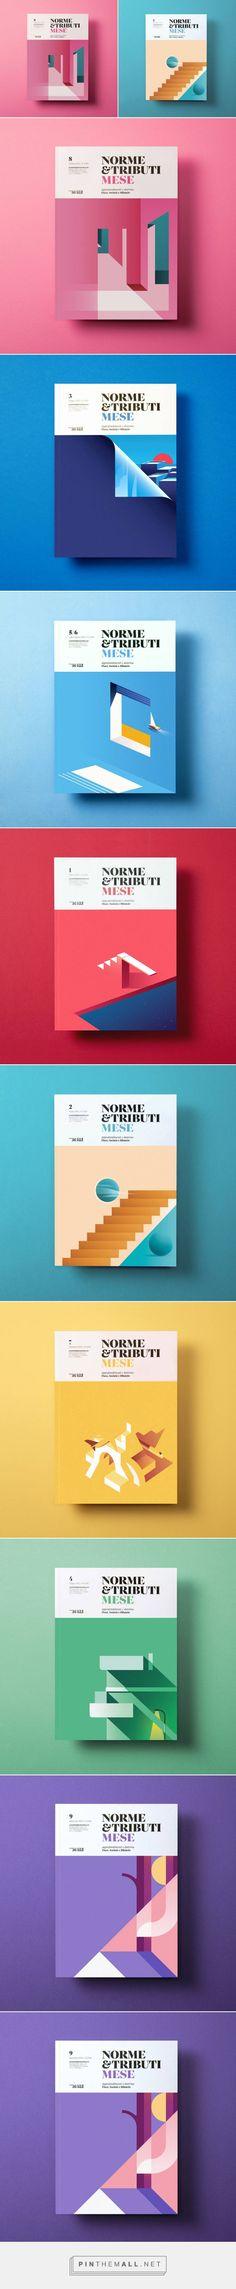 Cover Design for Italian Economic Revue – Fubiz Media - created via https://pinthemall.net